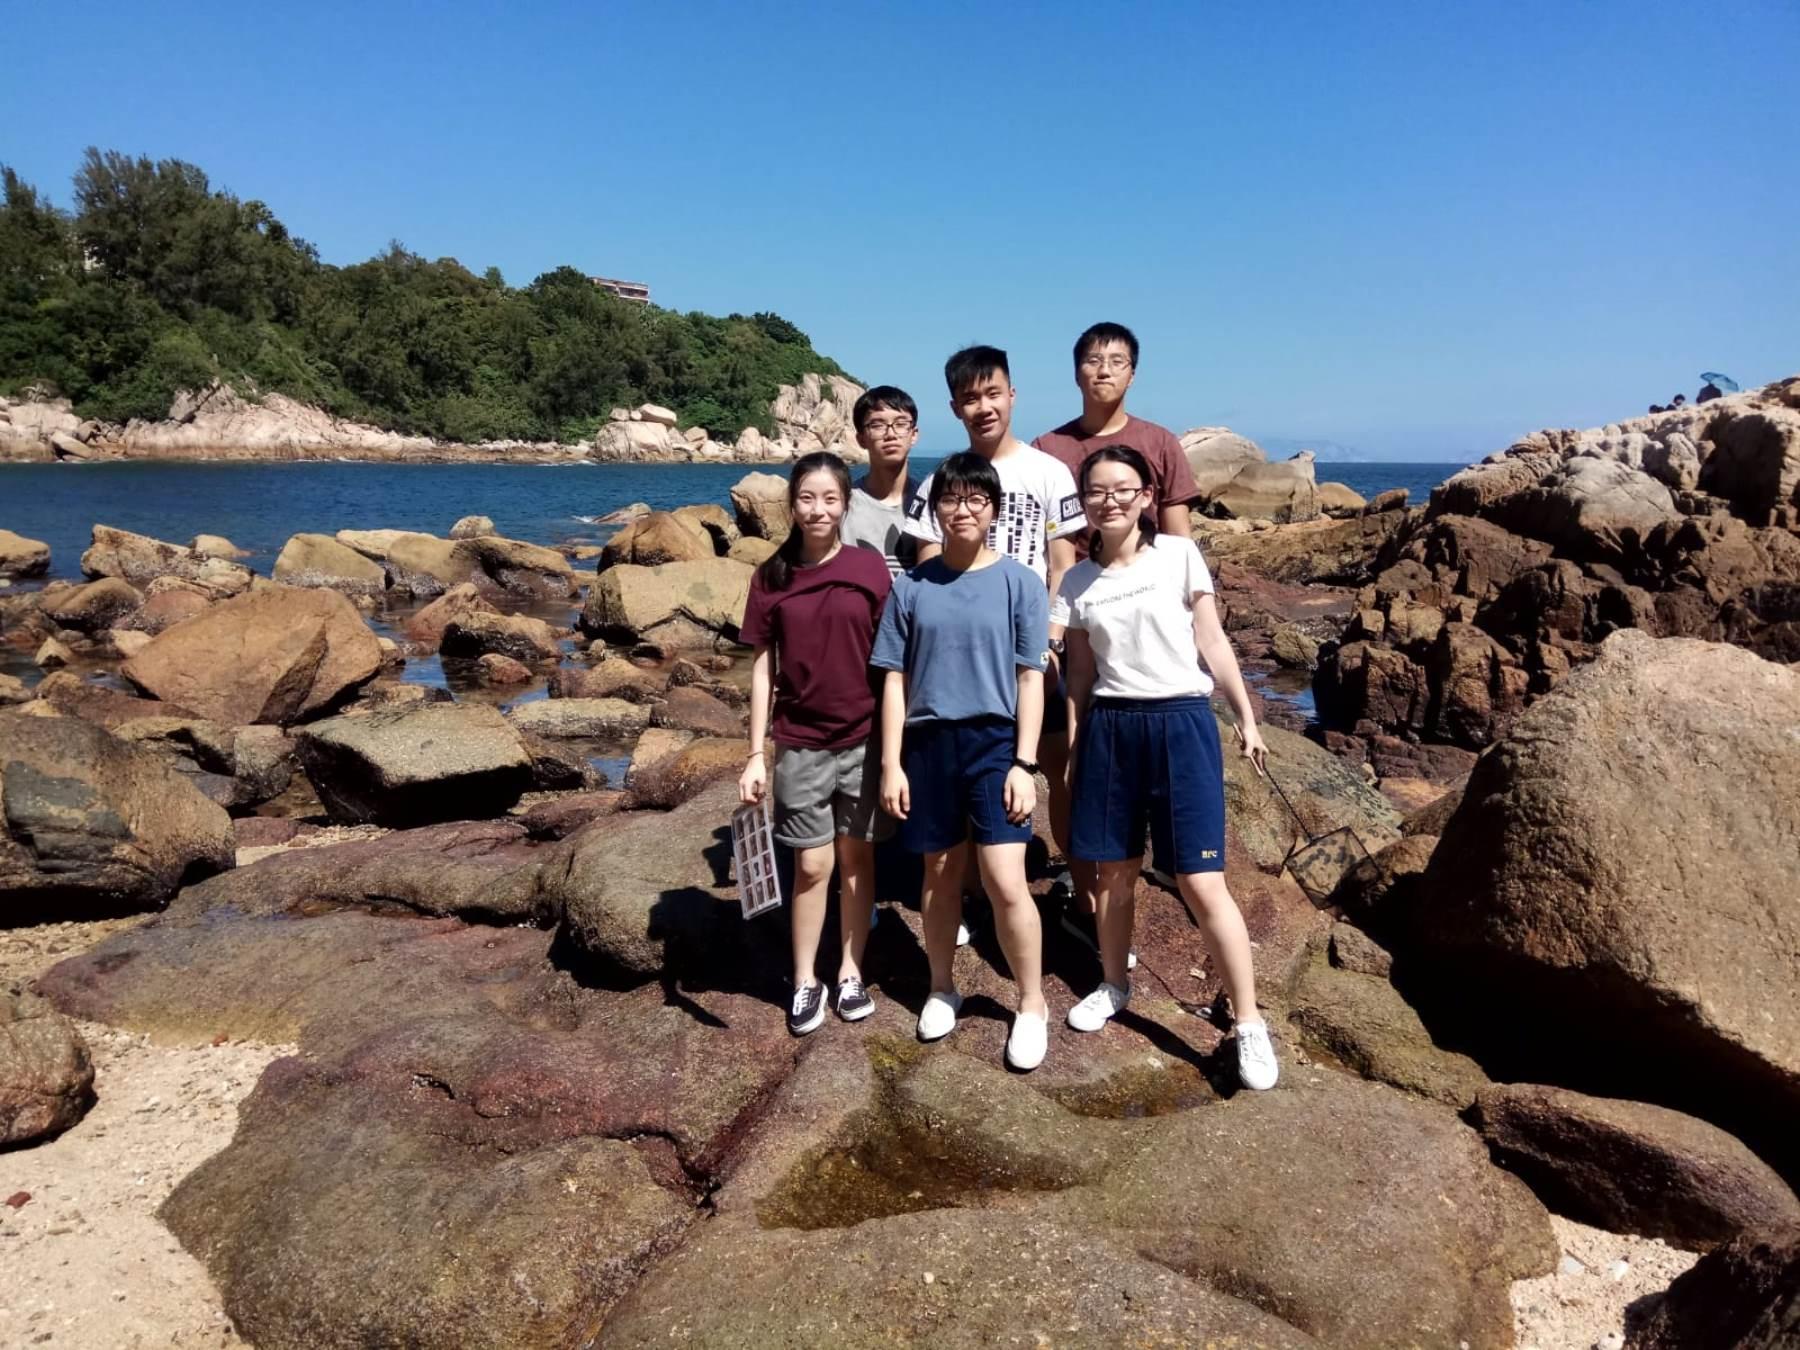 http://www.npc.edu.hk/sites/default/files/16_85.jpg